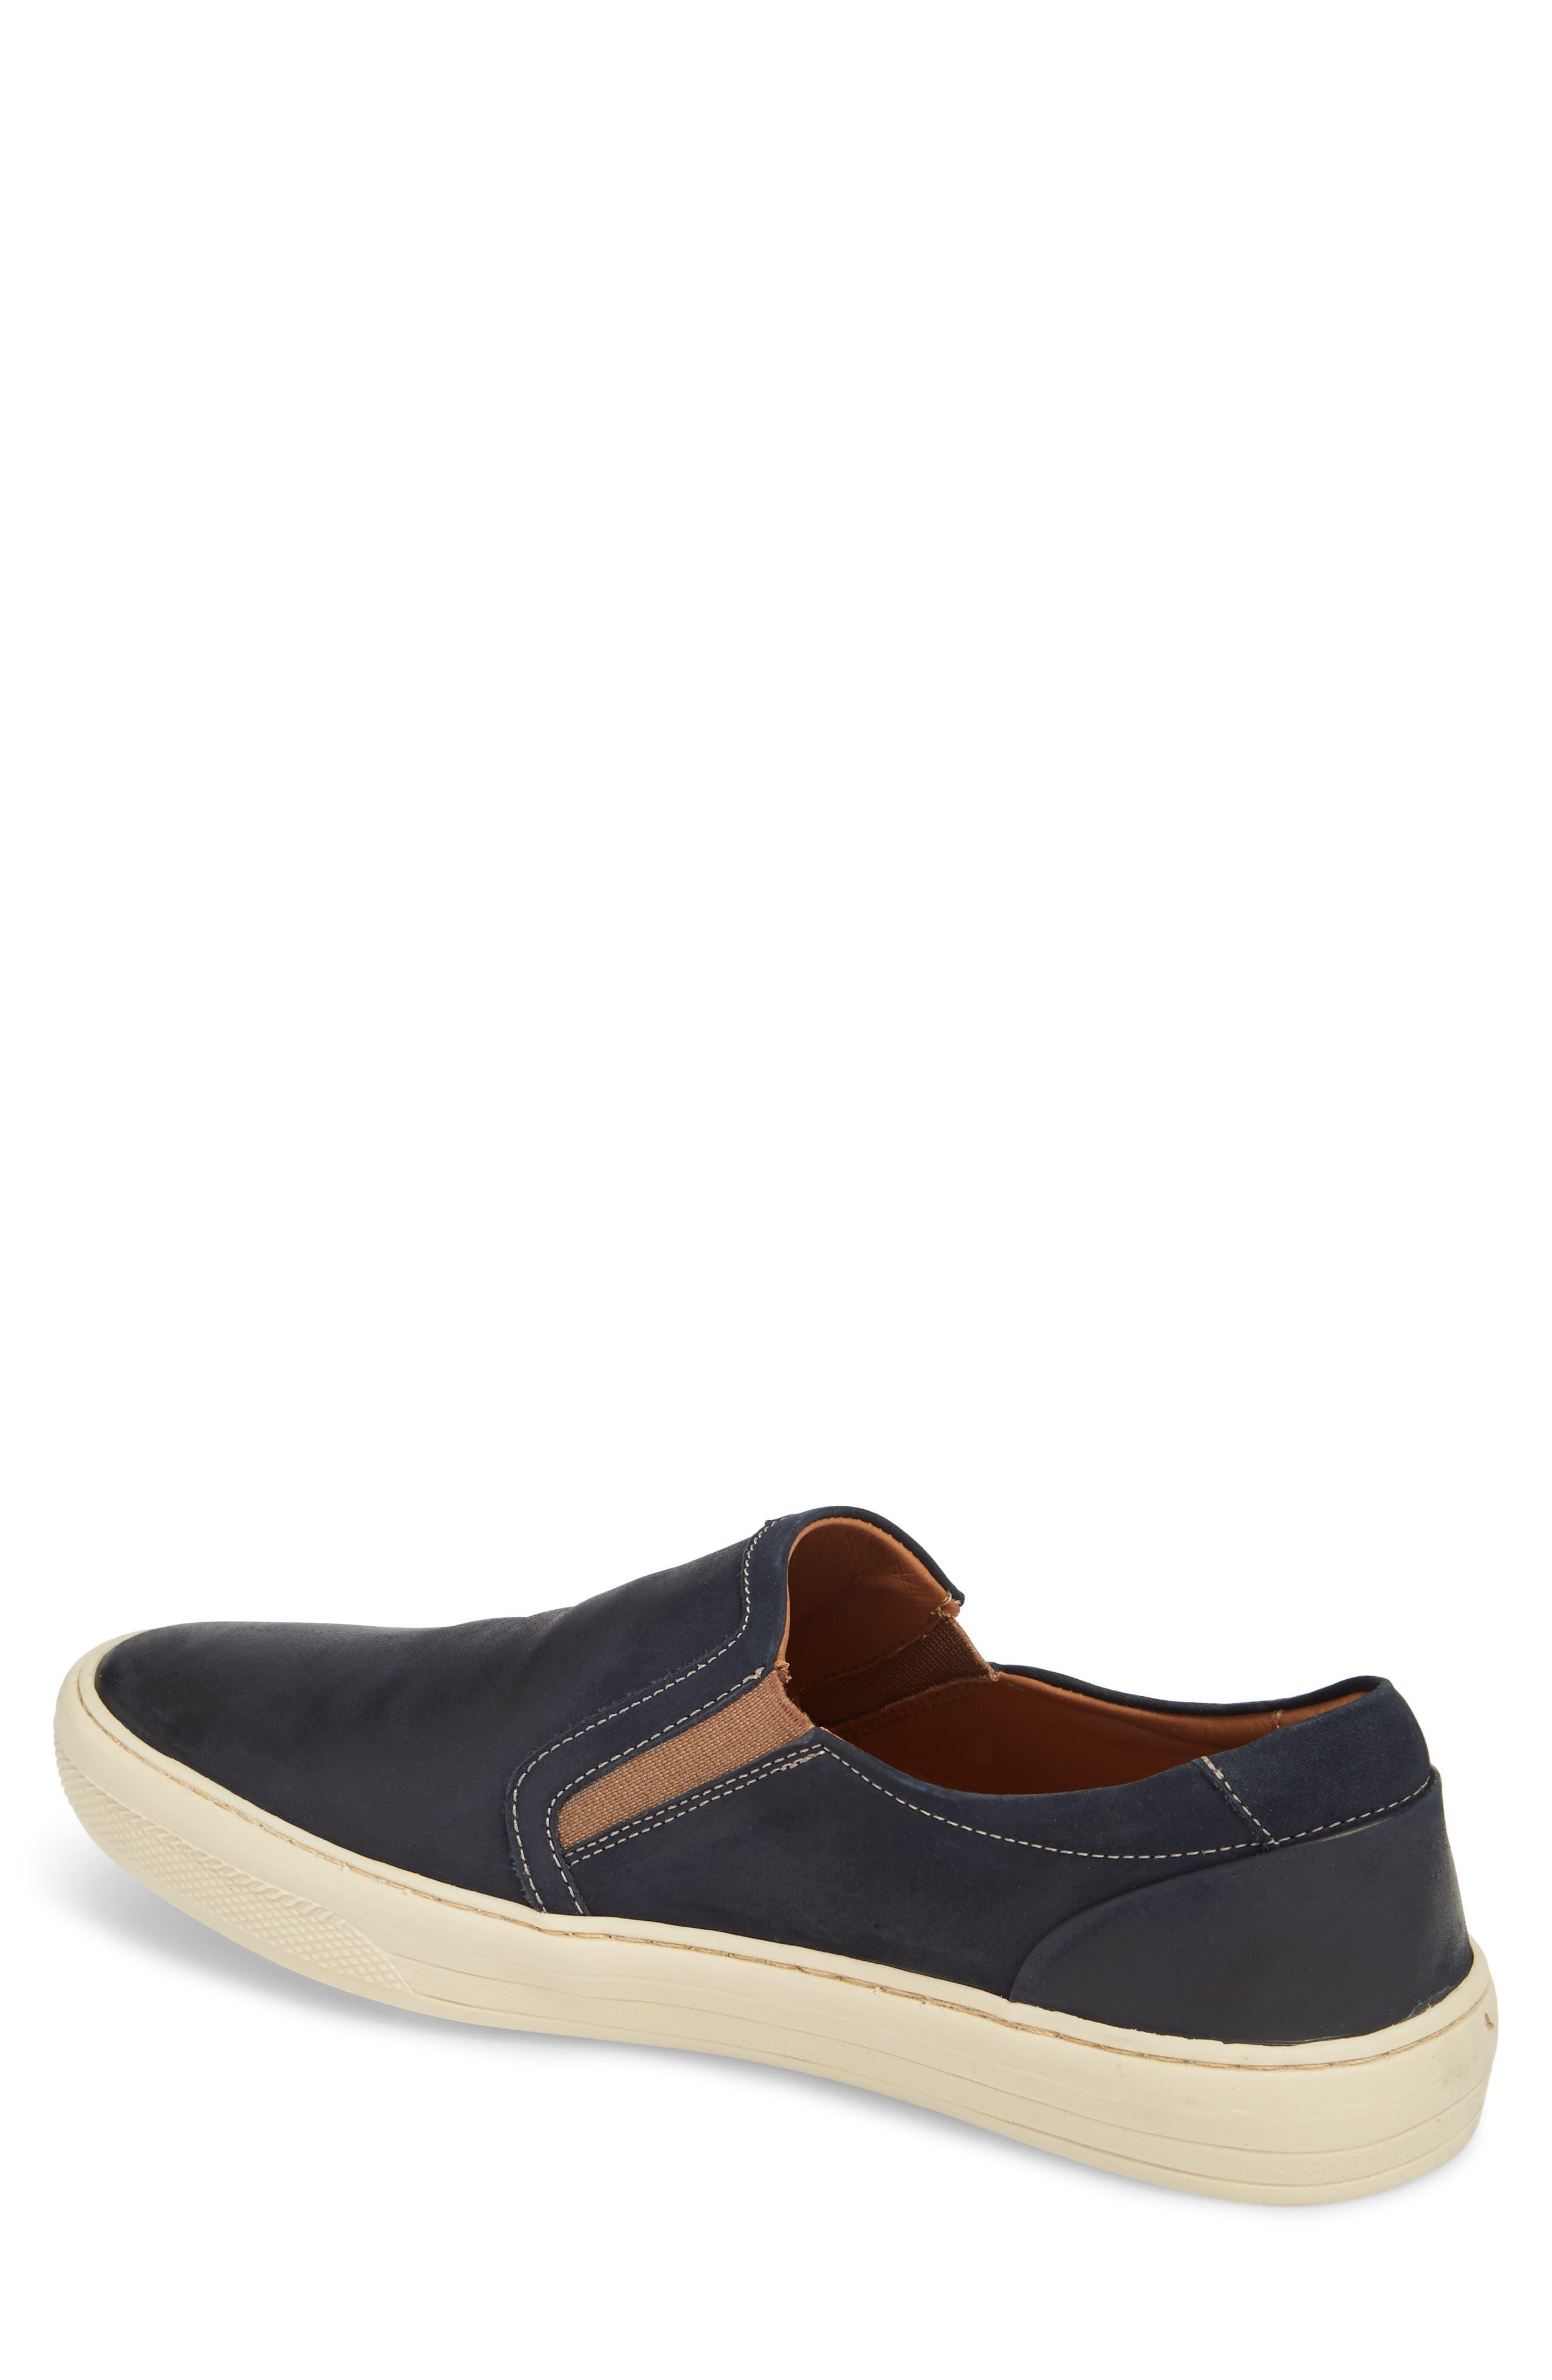 Alternate Image 2  - ANATOMIC & CO. Itabuna Slip-On Sneaker (Men)